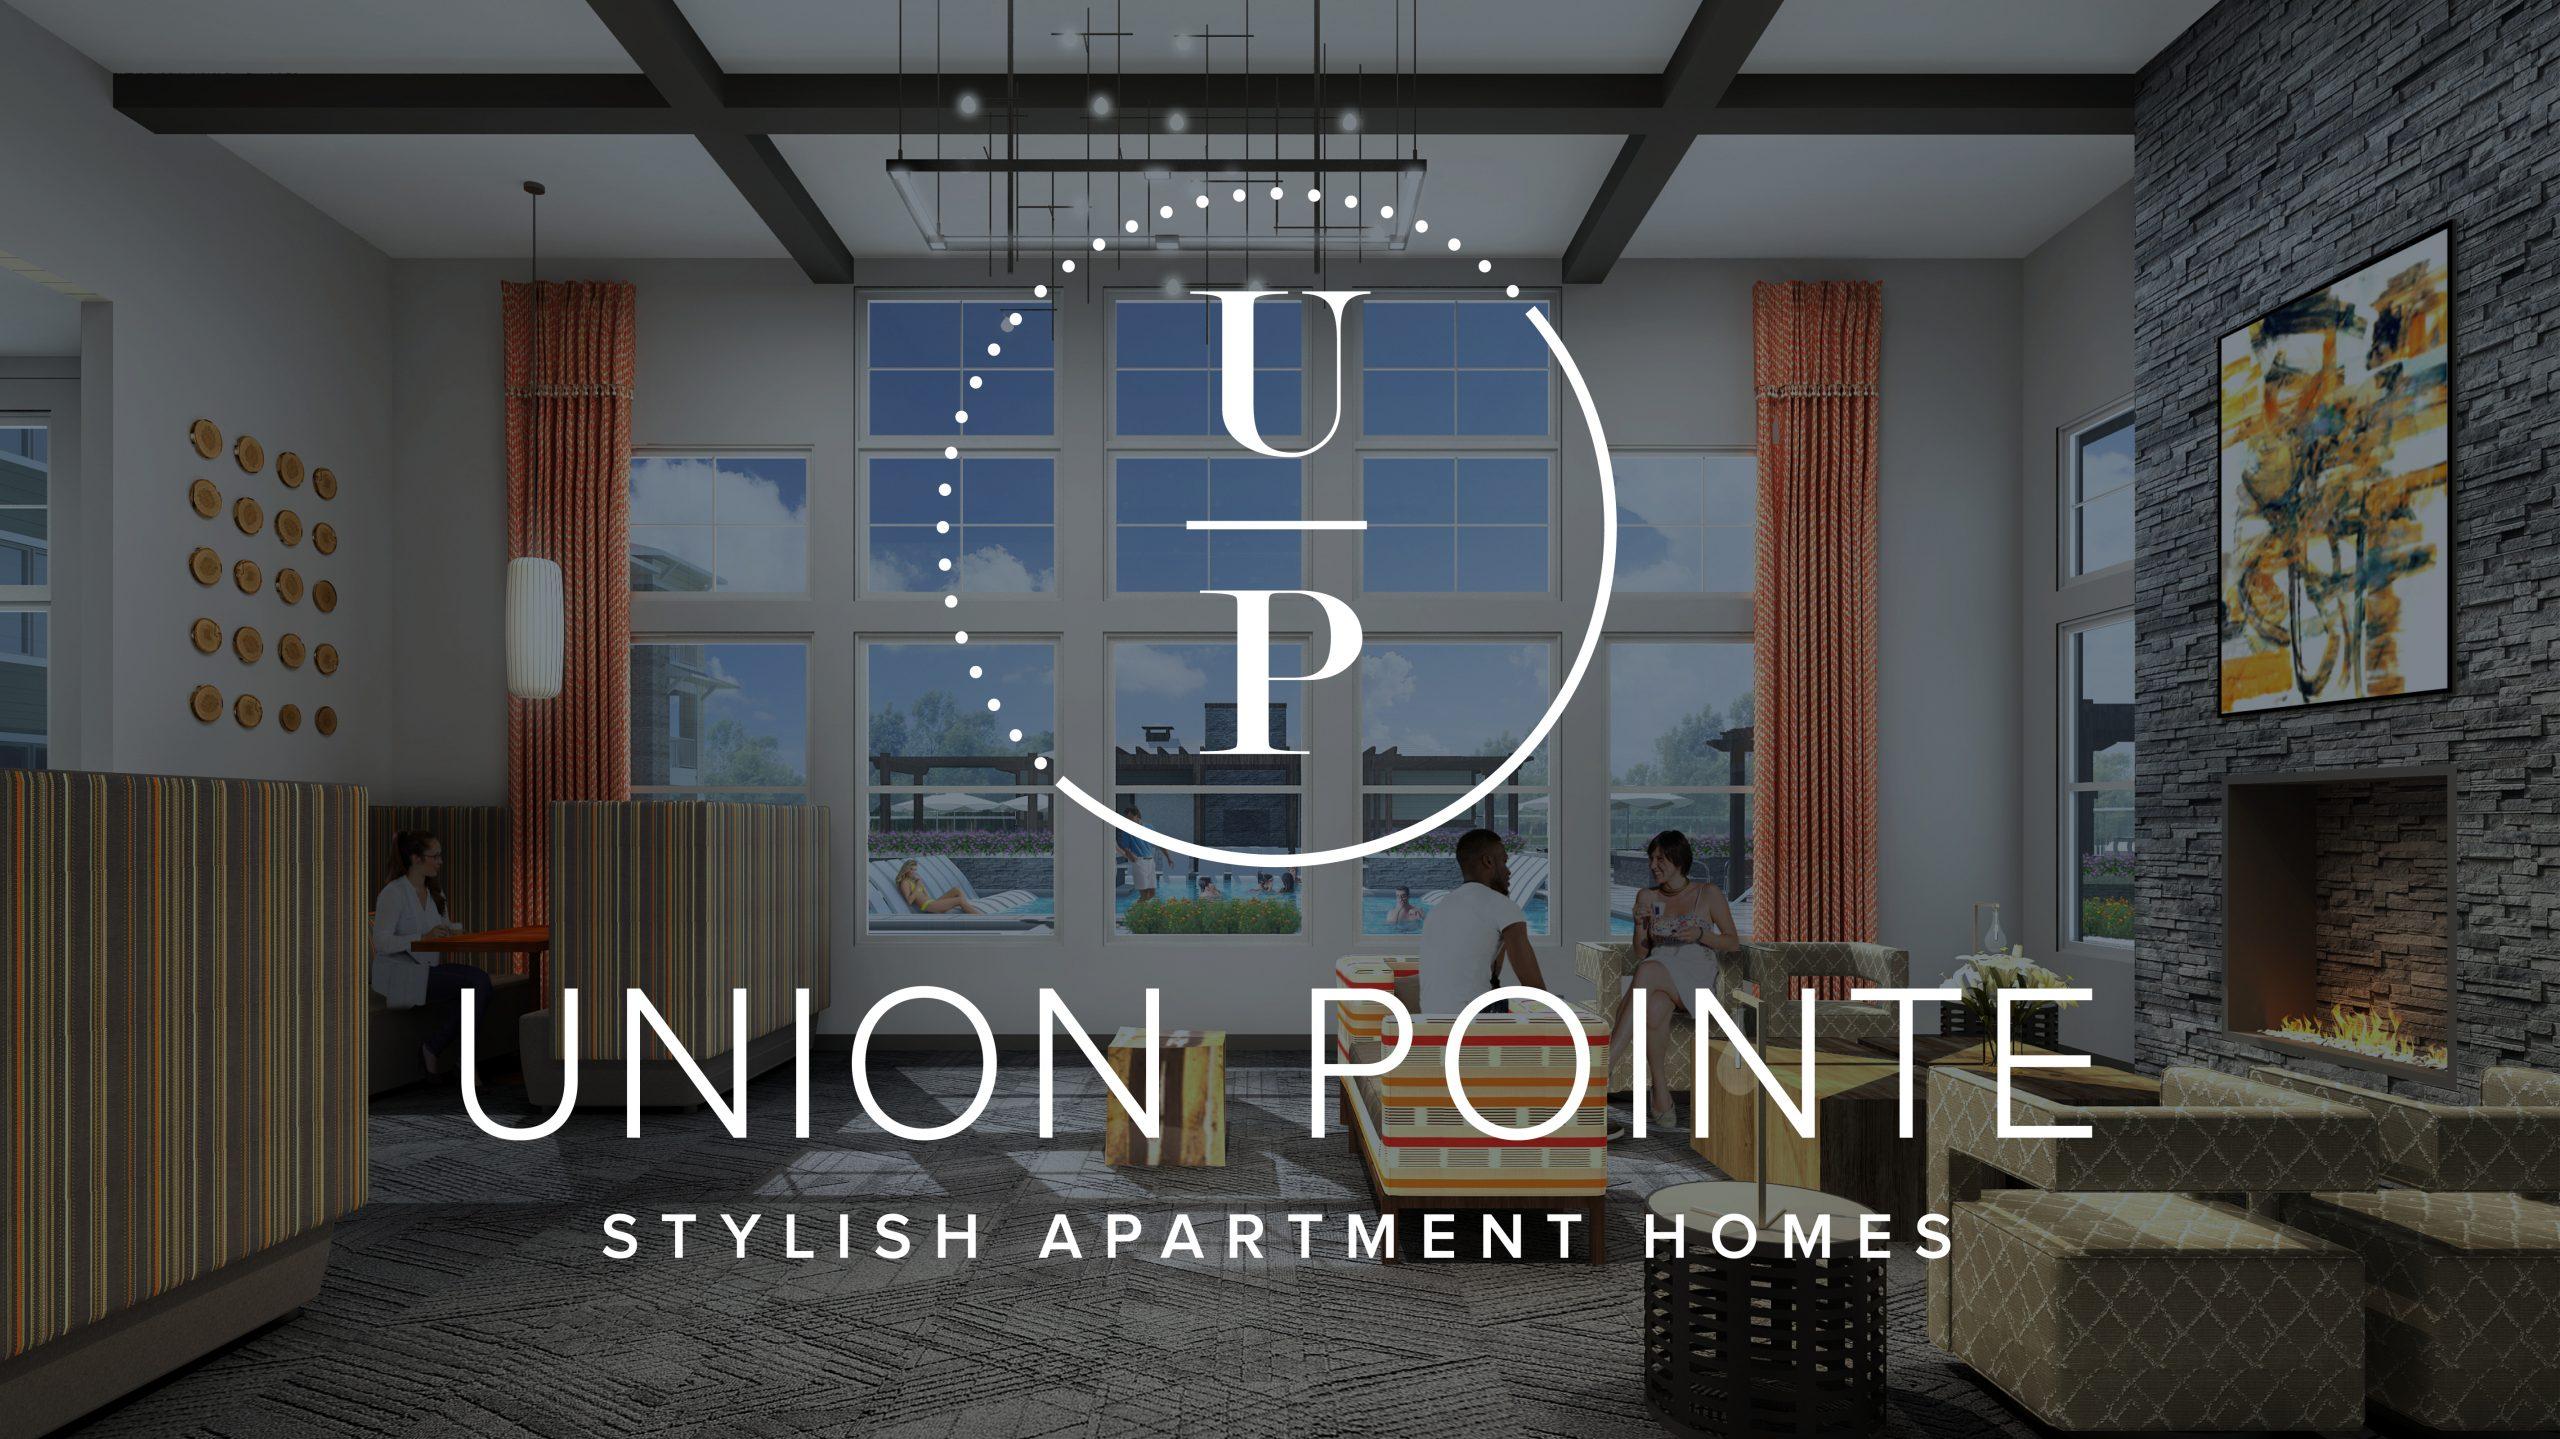 Union Pointe